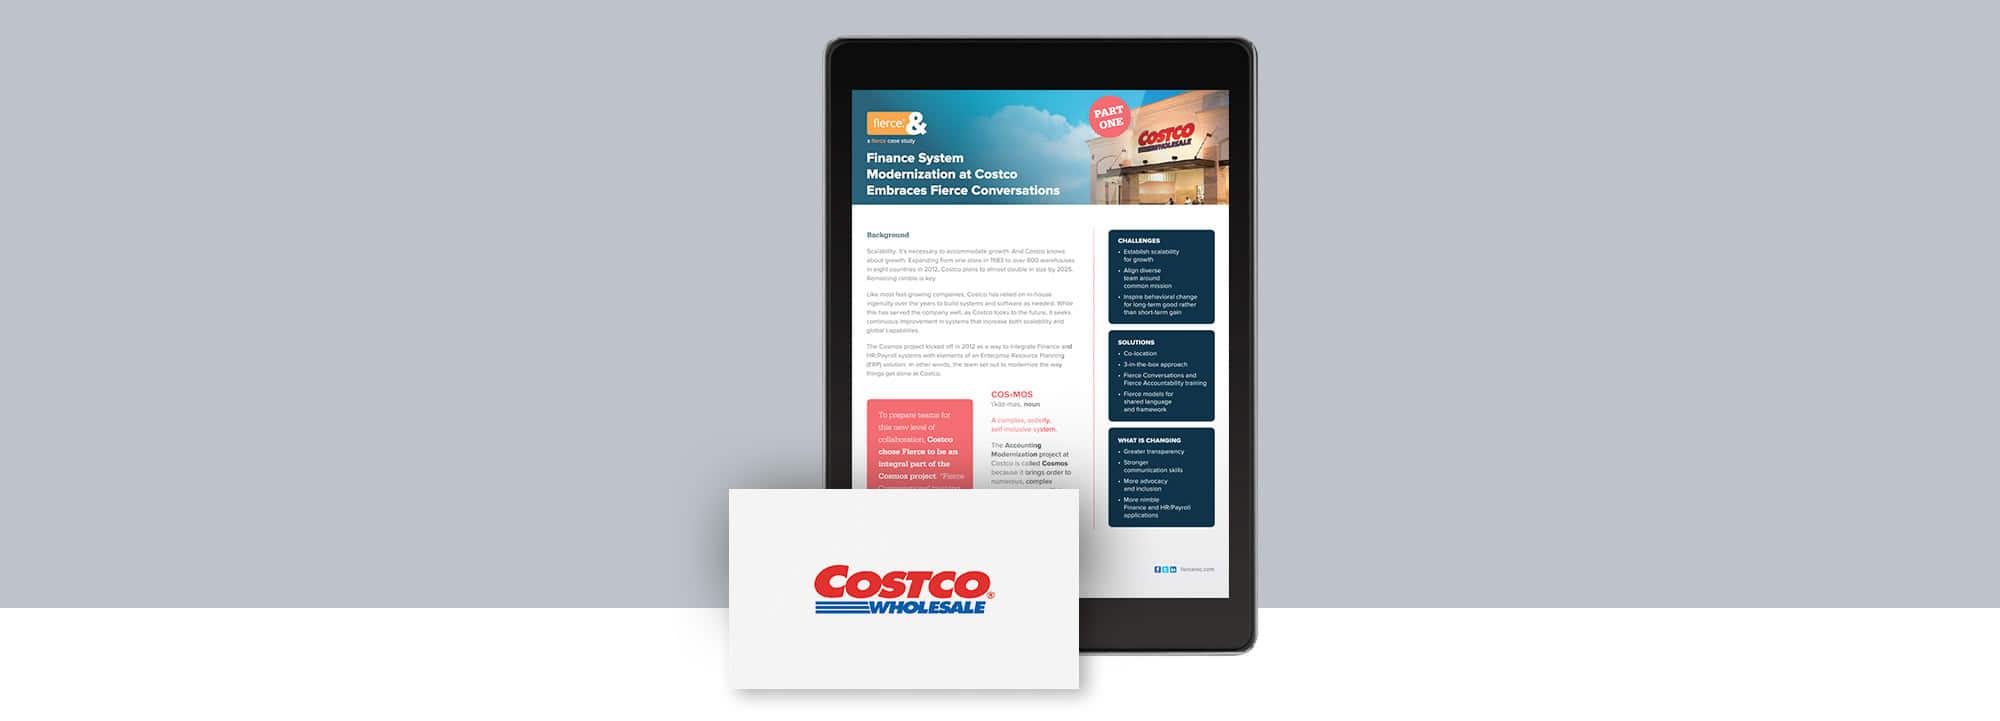 Fierce Conversations Costco Case Study